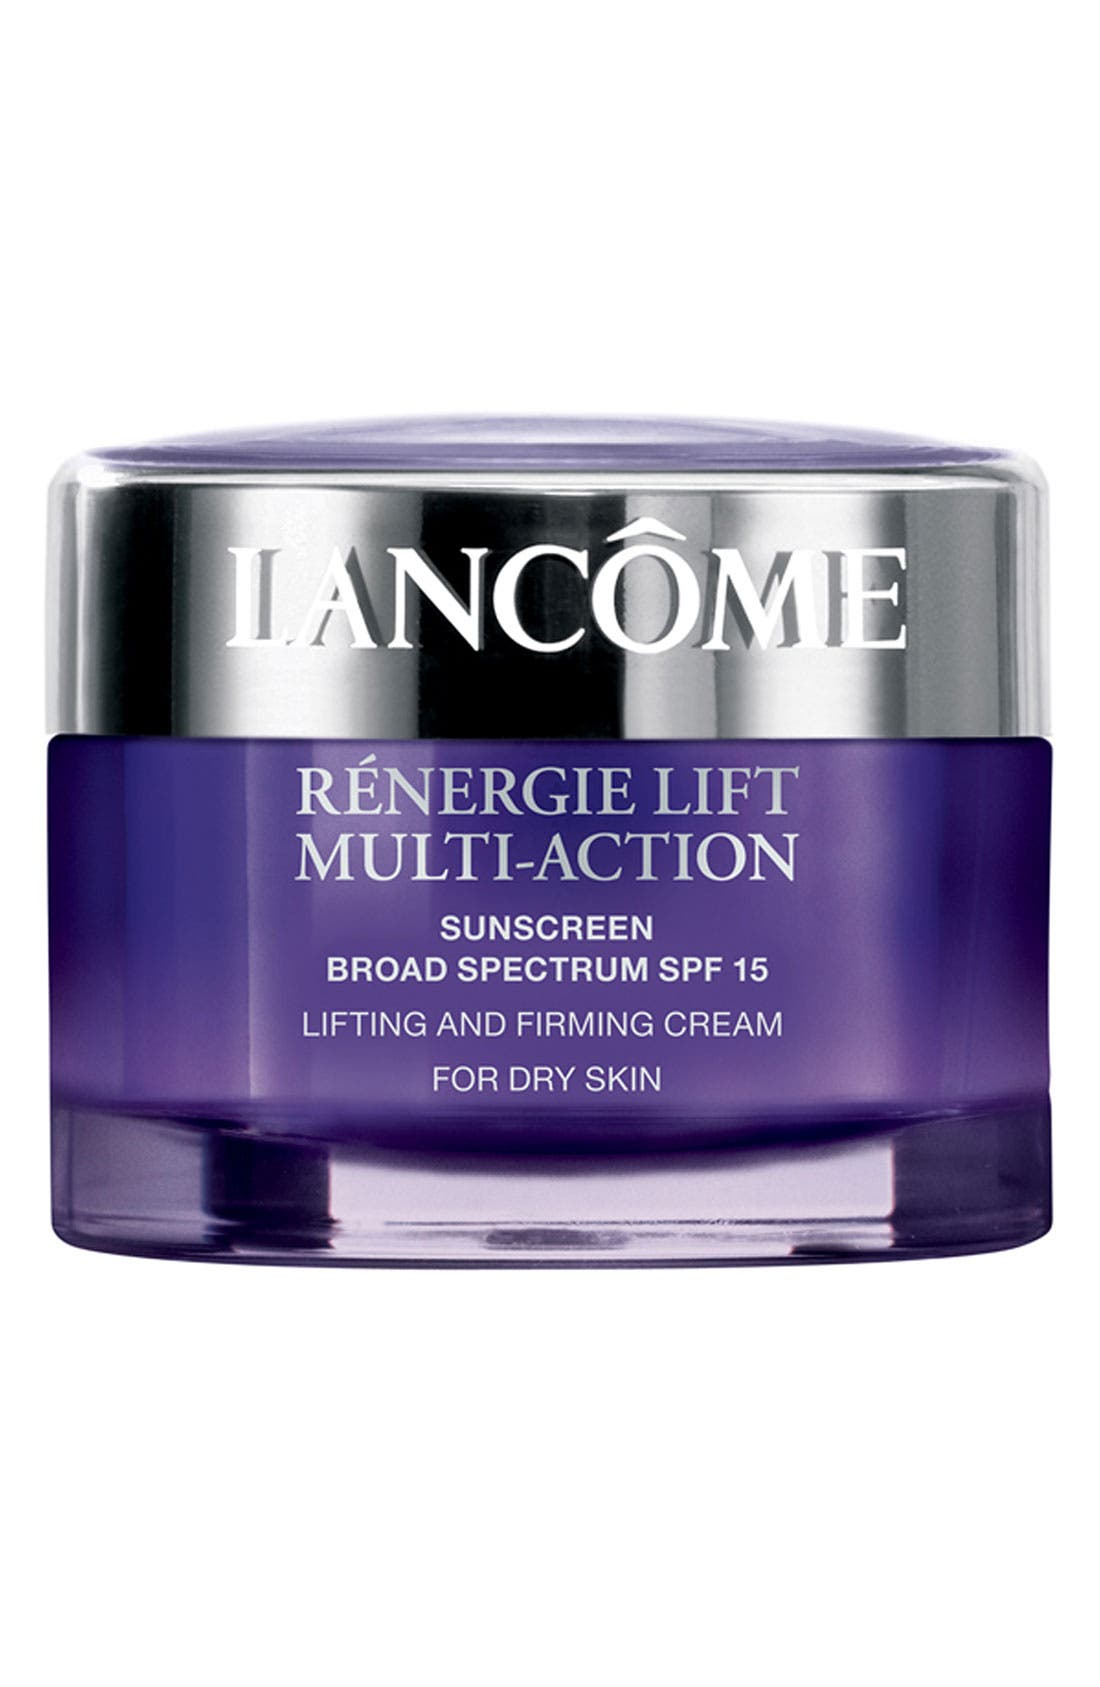 Lancôme Rénergie Lift Multi Action Moisturizer Cream SPF 15 for Dry Skin